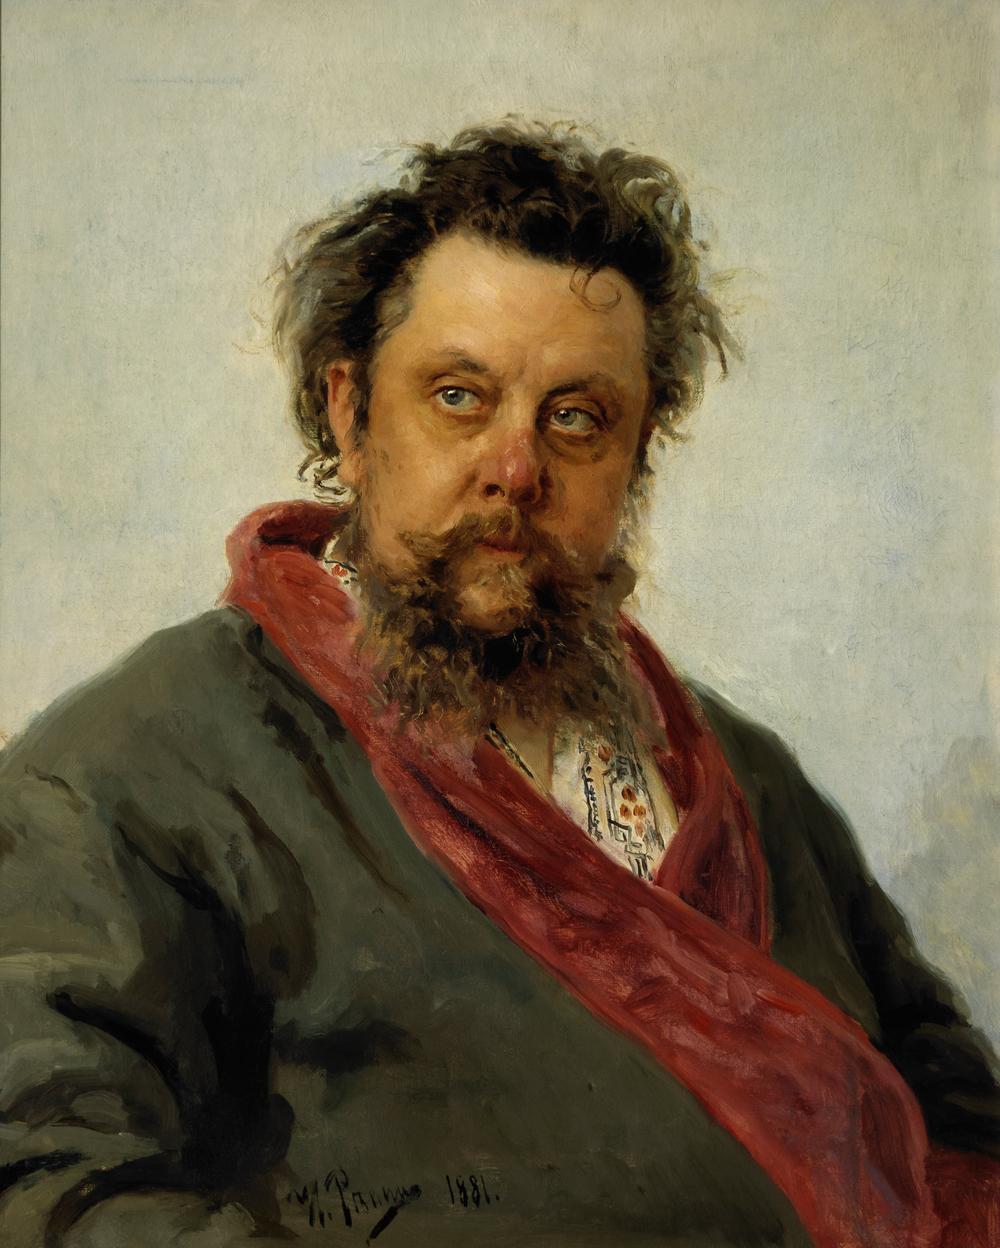 Modest Mussorgsky - Portrait by Ilya Repin